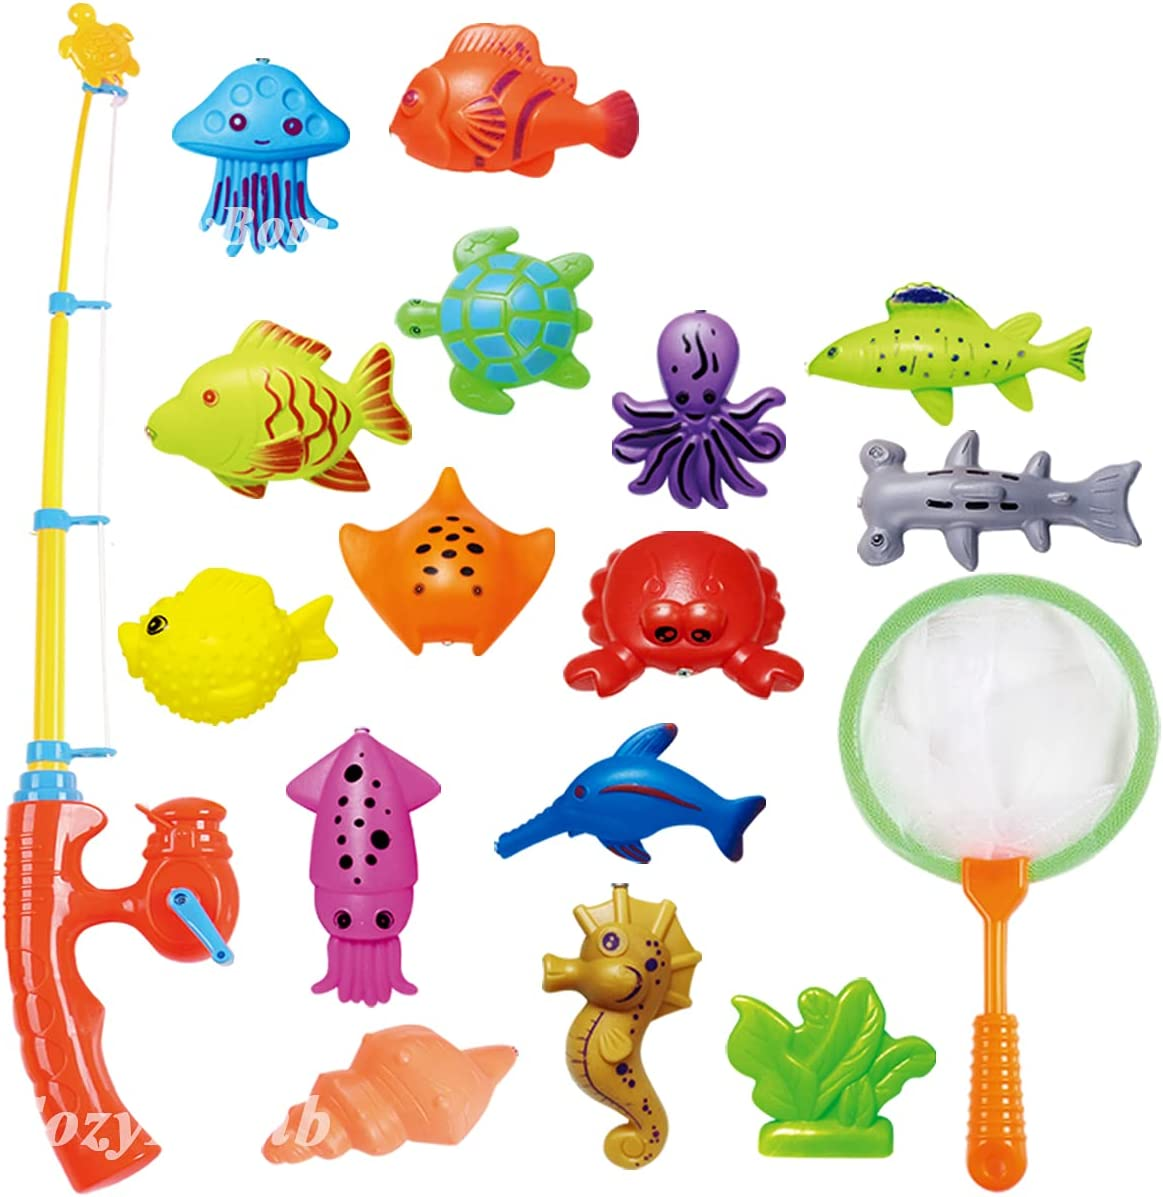 CozyBomB Kids Fishing Bath Toys Game - 17Pcs Magnetic Floating Toy Magnet...